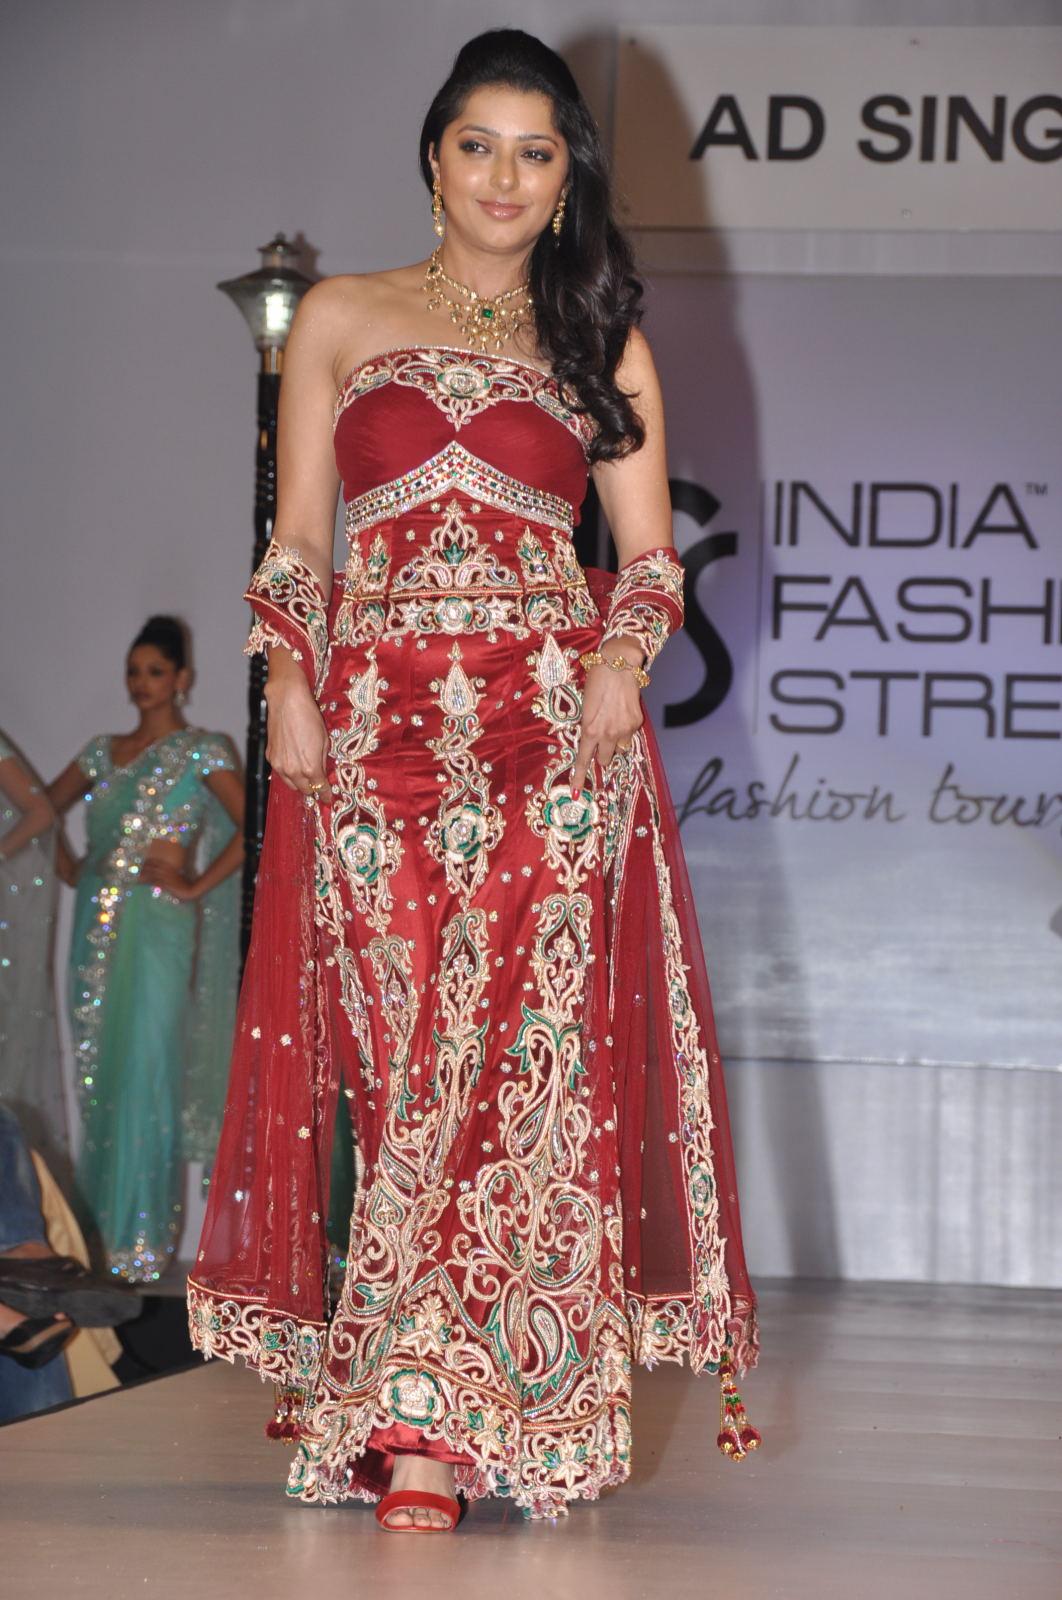 India fashion street in bhumika